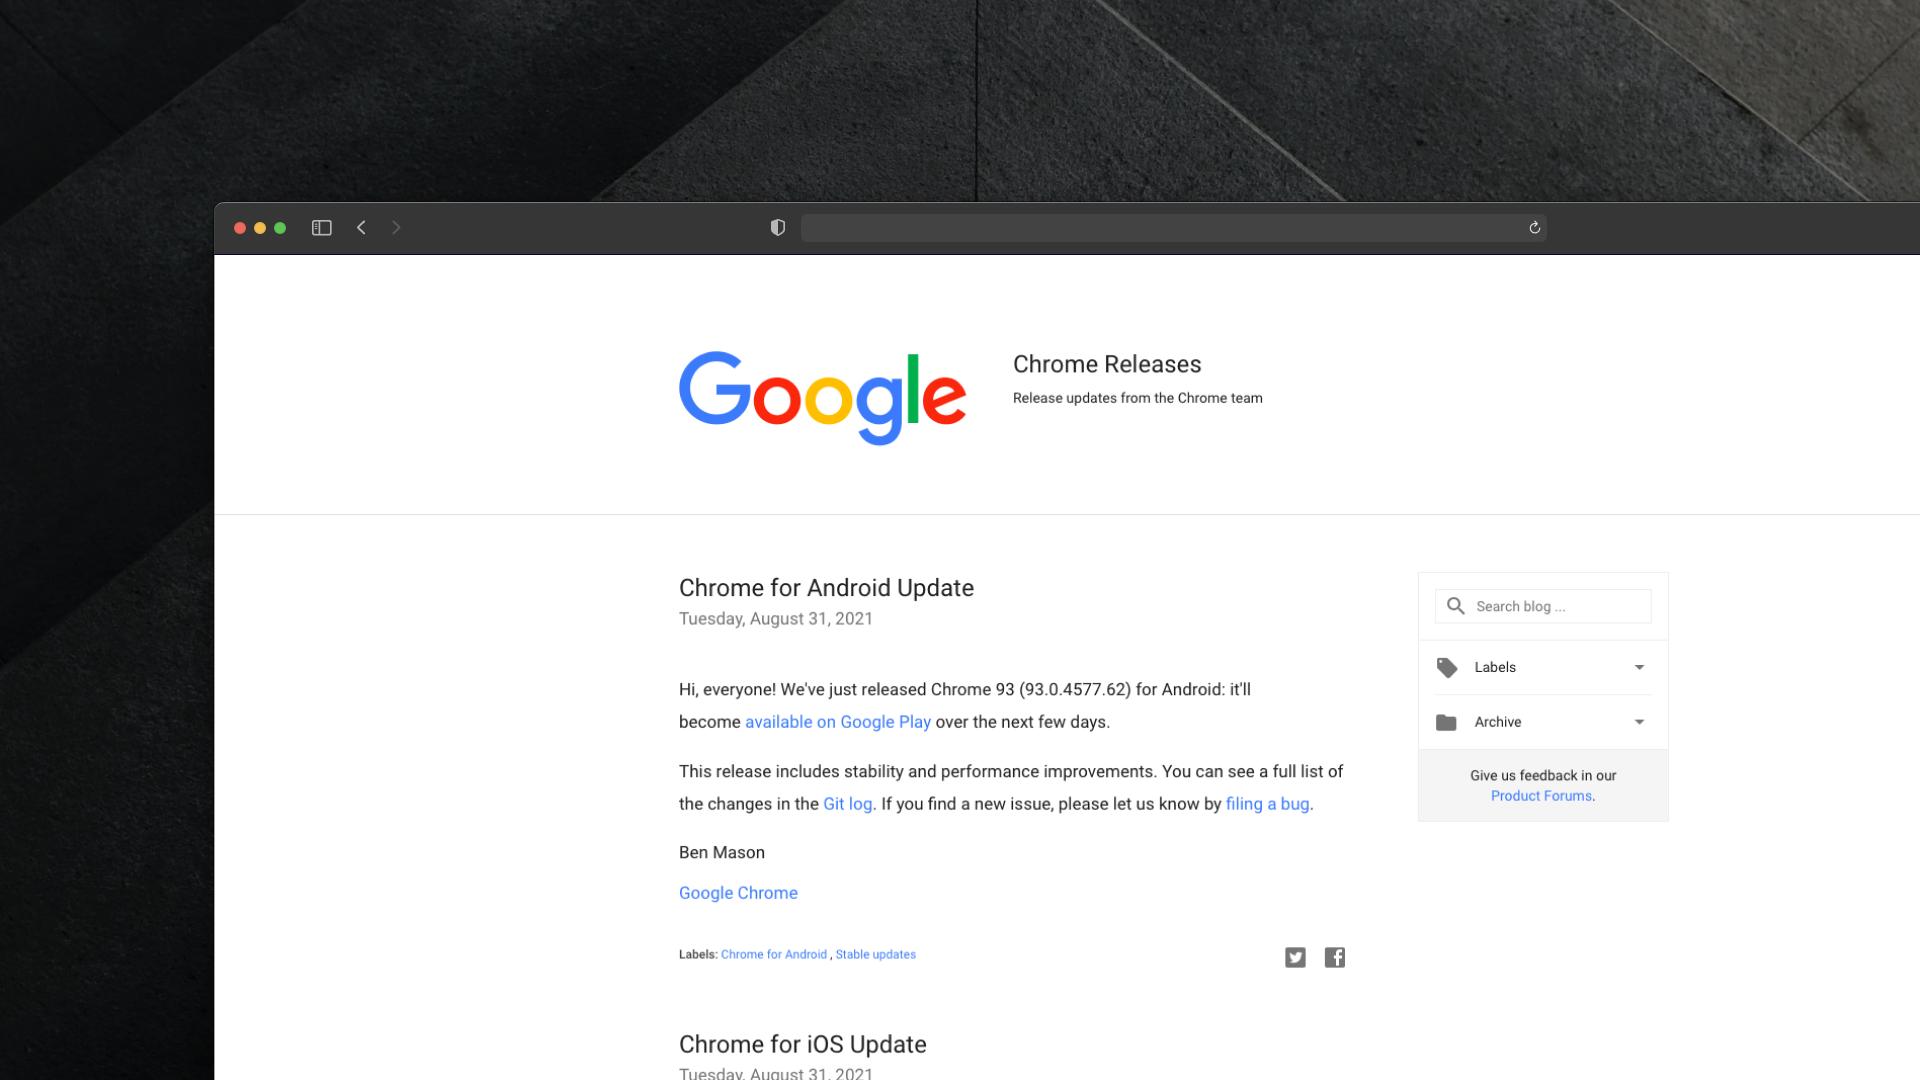 Google Chrome Releases Changelog Screenshot